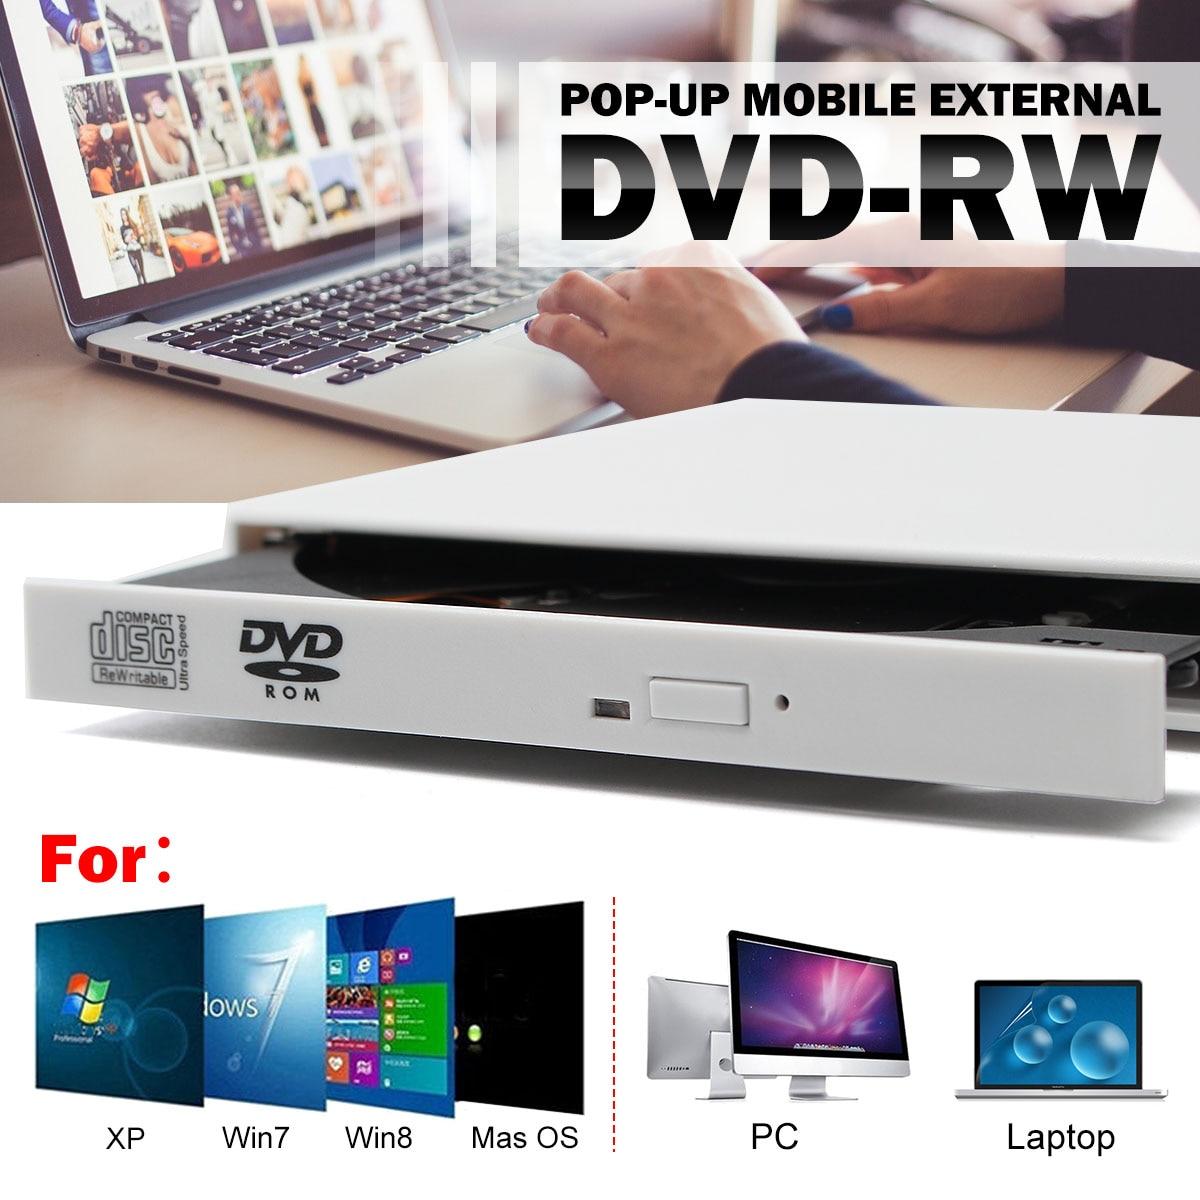 S SKYEE Slim External Optical Drive USB 2.0 DVD Combo DVD ROM Player CD-RW Burner Writer Plug and Play For Laptop Desktop PC